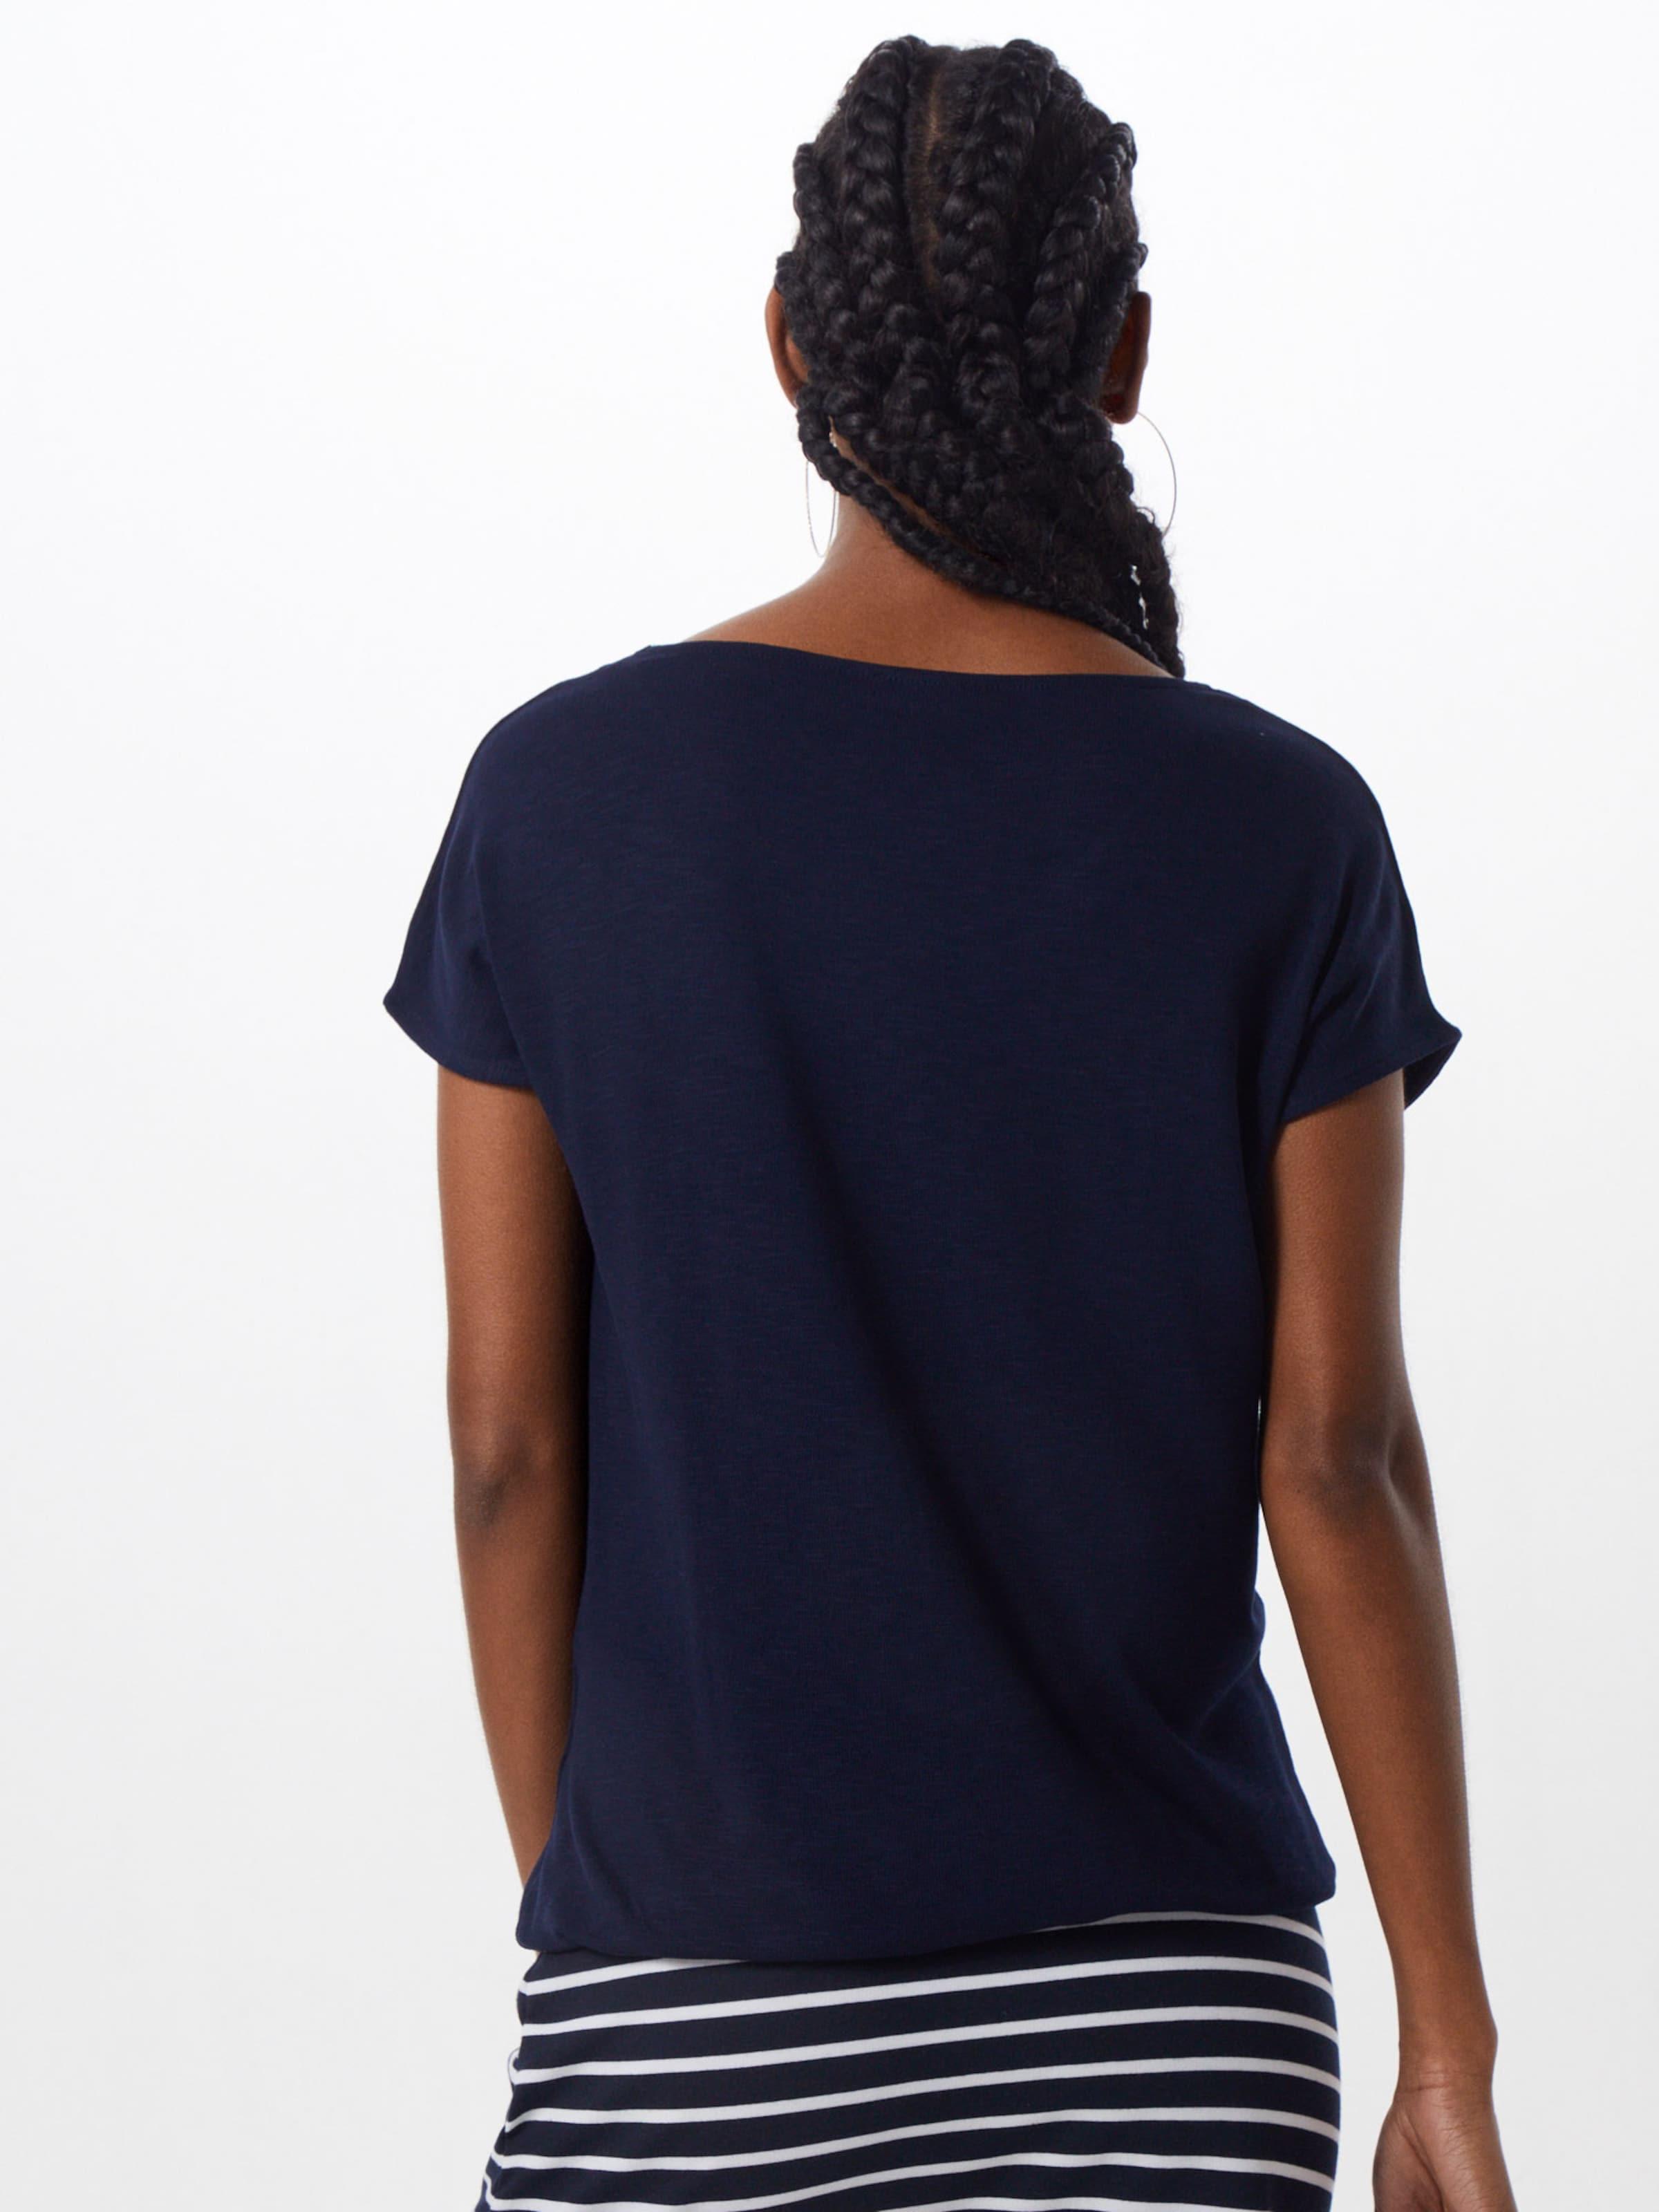 Blau Street 'vianna' One In Shirt MpSzVU